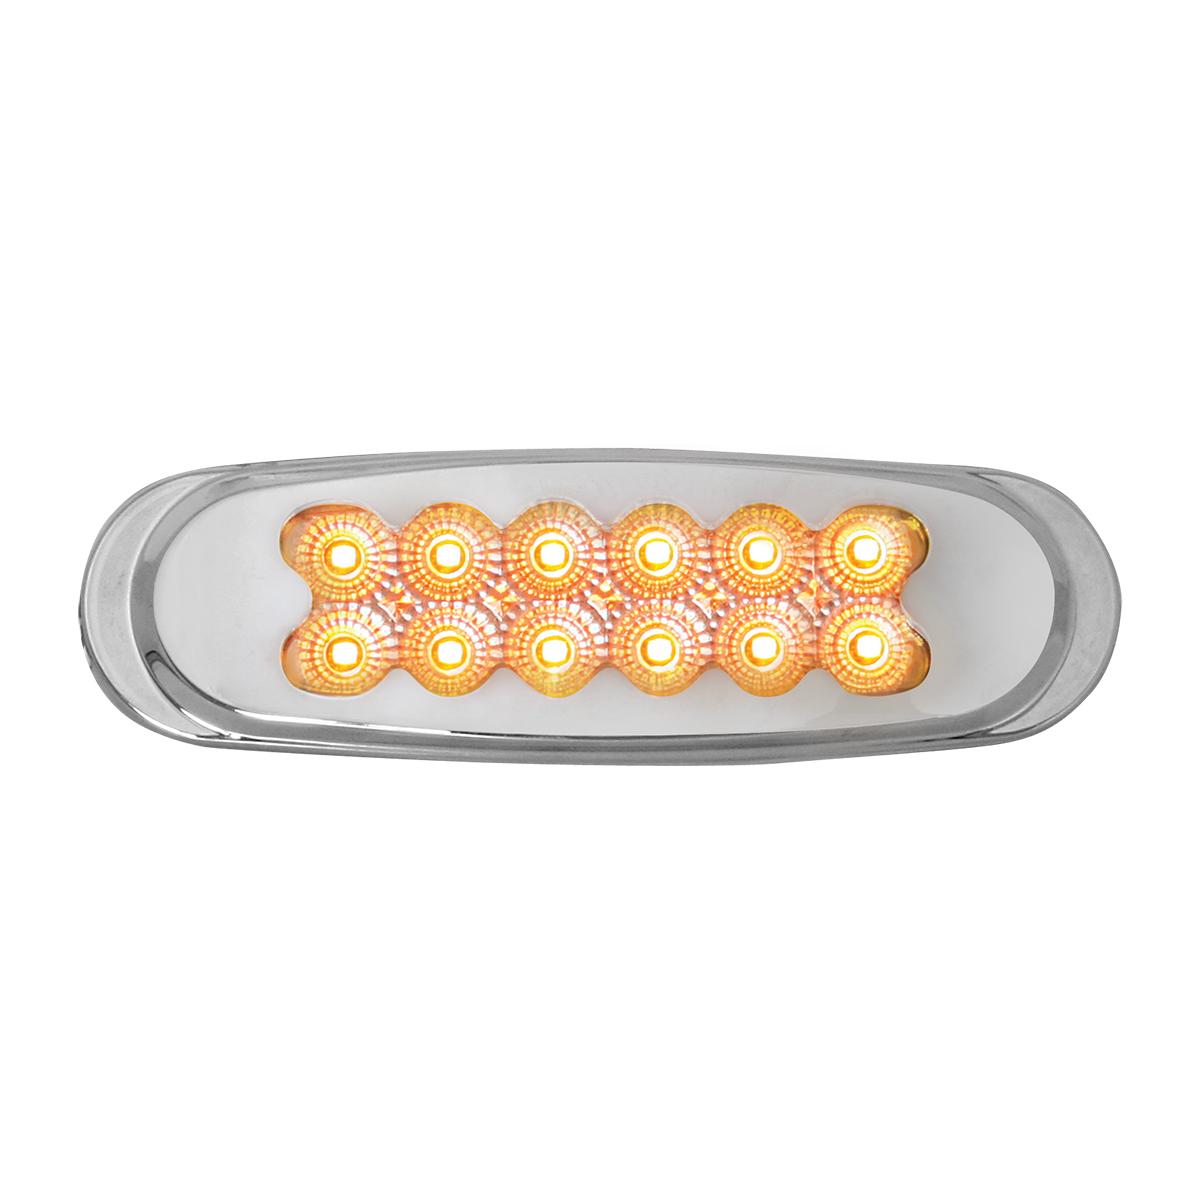 76706 Ultra Thin Dual Function Spyder LED Light w/ Chrome Plastic Matrix Bezel